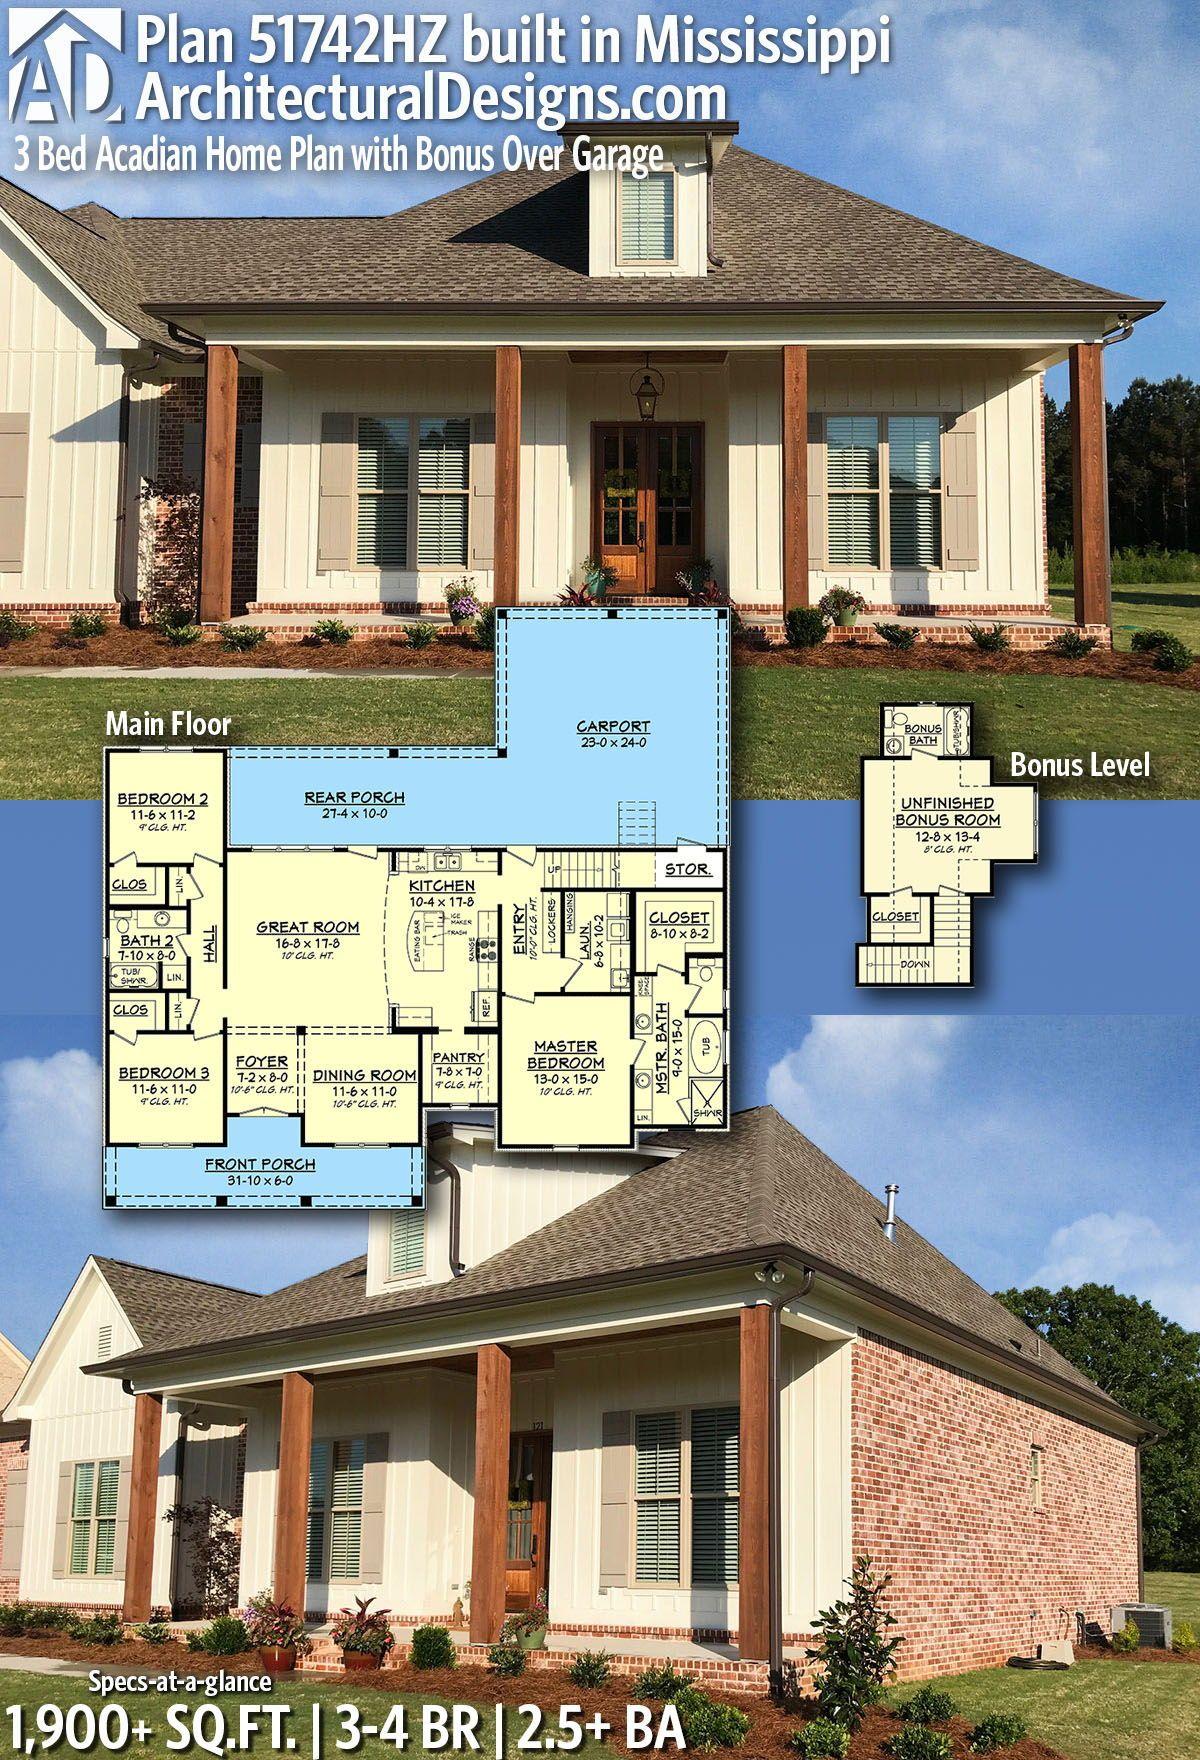 Plan 51742hz 3 Bed Acadian Home Plan With Bonus Over Carport Acadian House Plans Acadian Homes House Plans